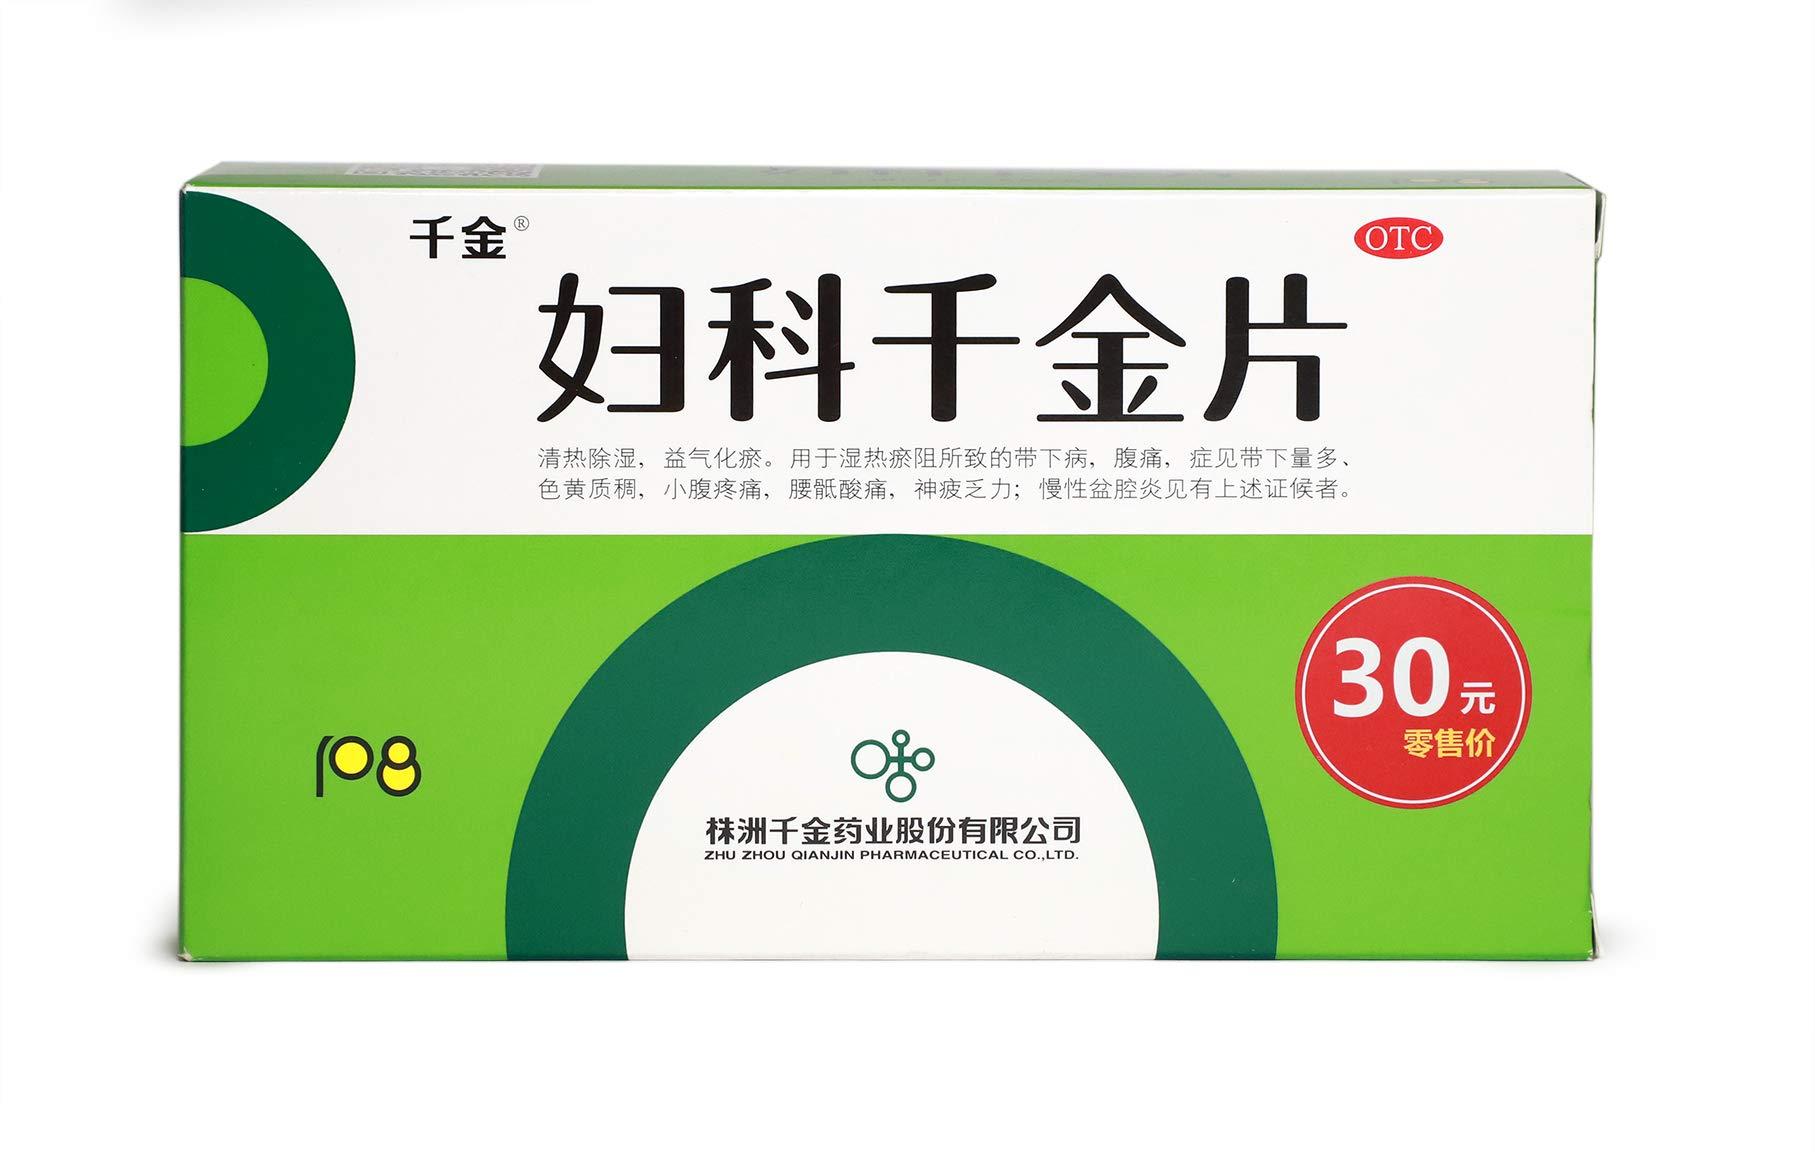 Fu Ke Qian Jin Tablet Herbal Supplement for Leukorrhagia, Abdominal Pain, Chronic Pelvic Inflammation, Endometritis, Chronic Cervicitis 108 Tablets